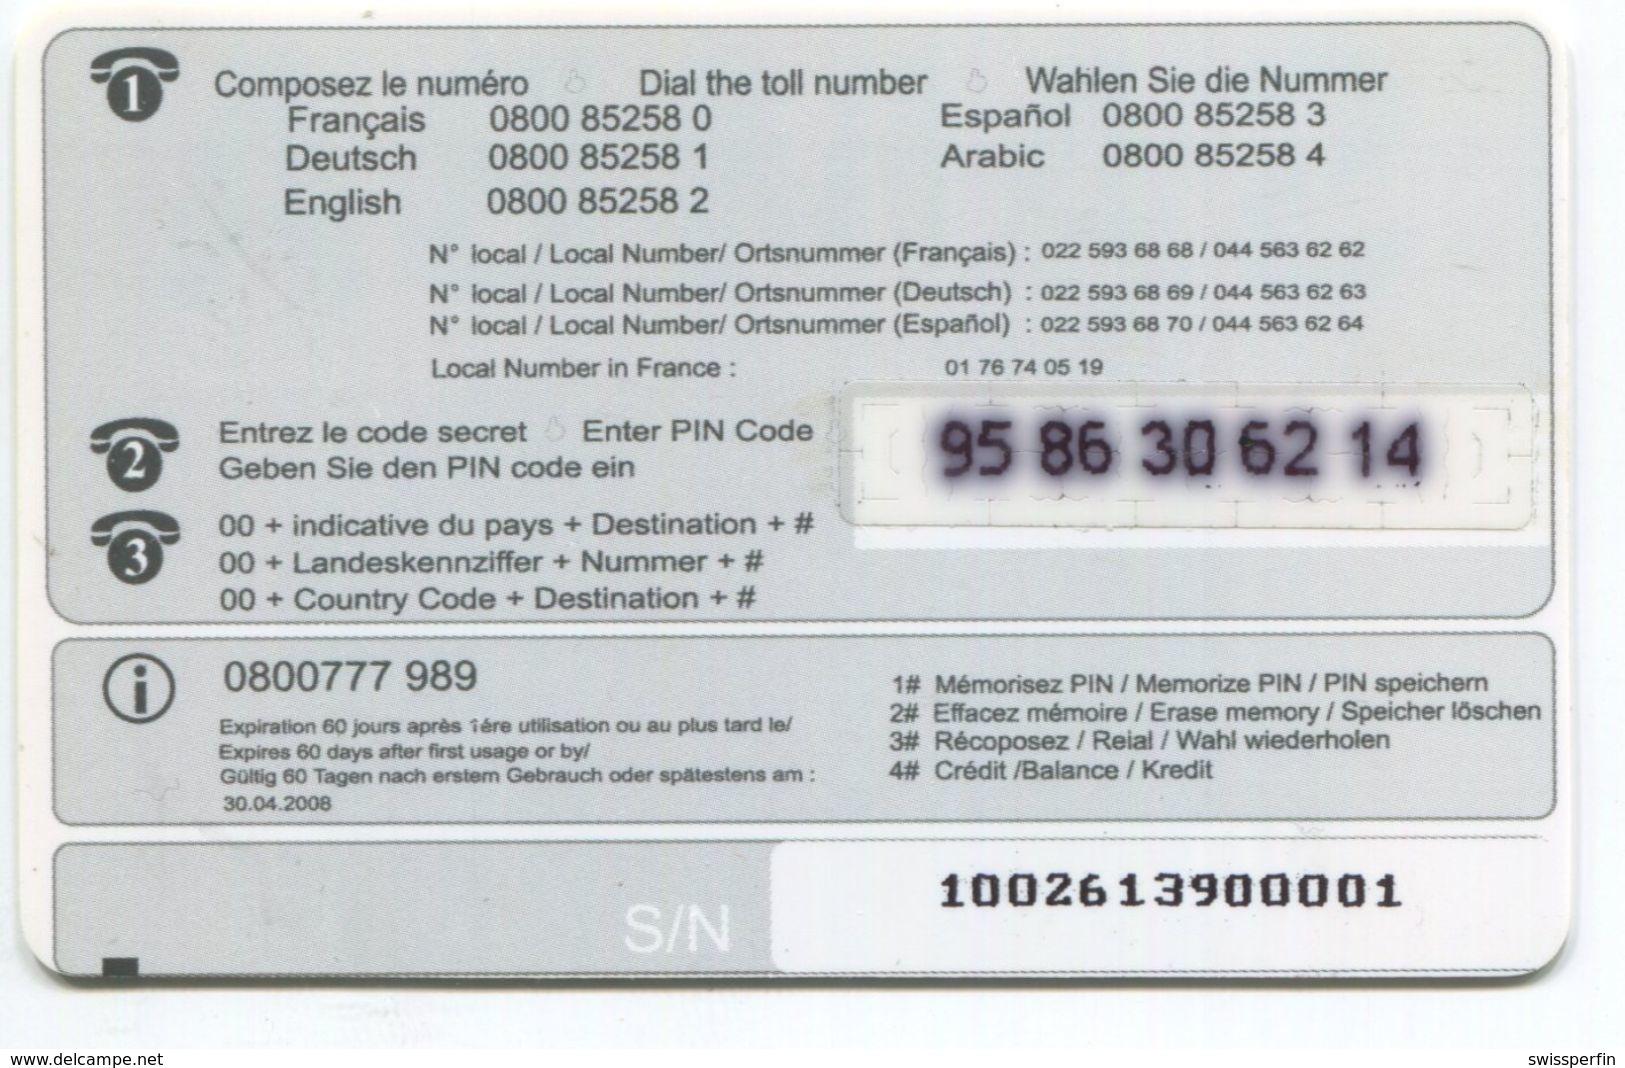 1663 - SAMBA 10 CHF Prepaid Telefonkarte - Suisse